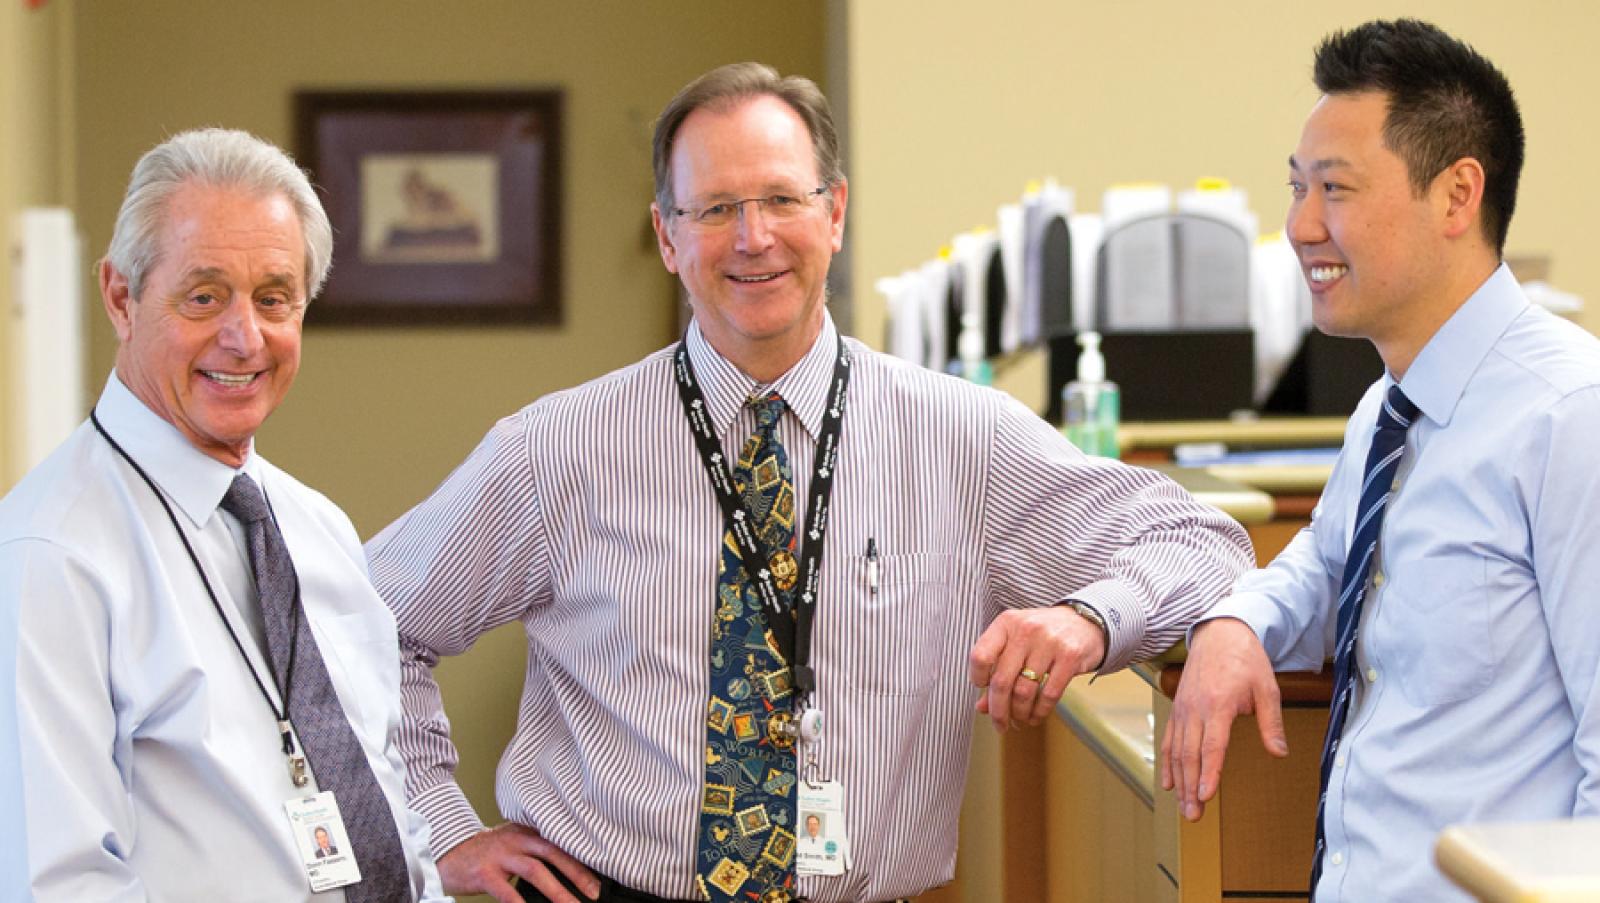 Doctors Donn Fassero (M'74), Todd Smith (M'91), and Richard Han (M'09)